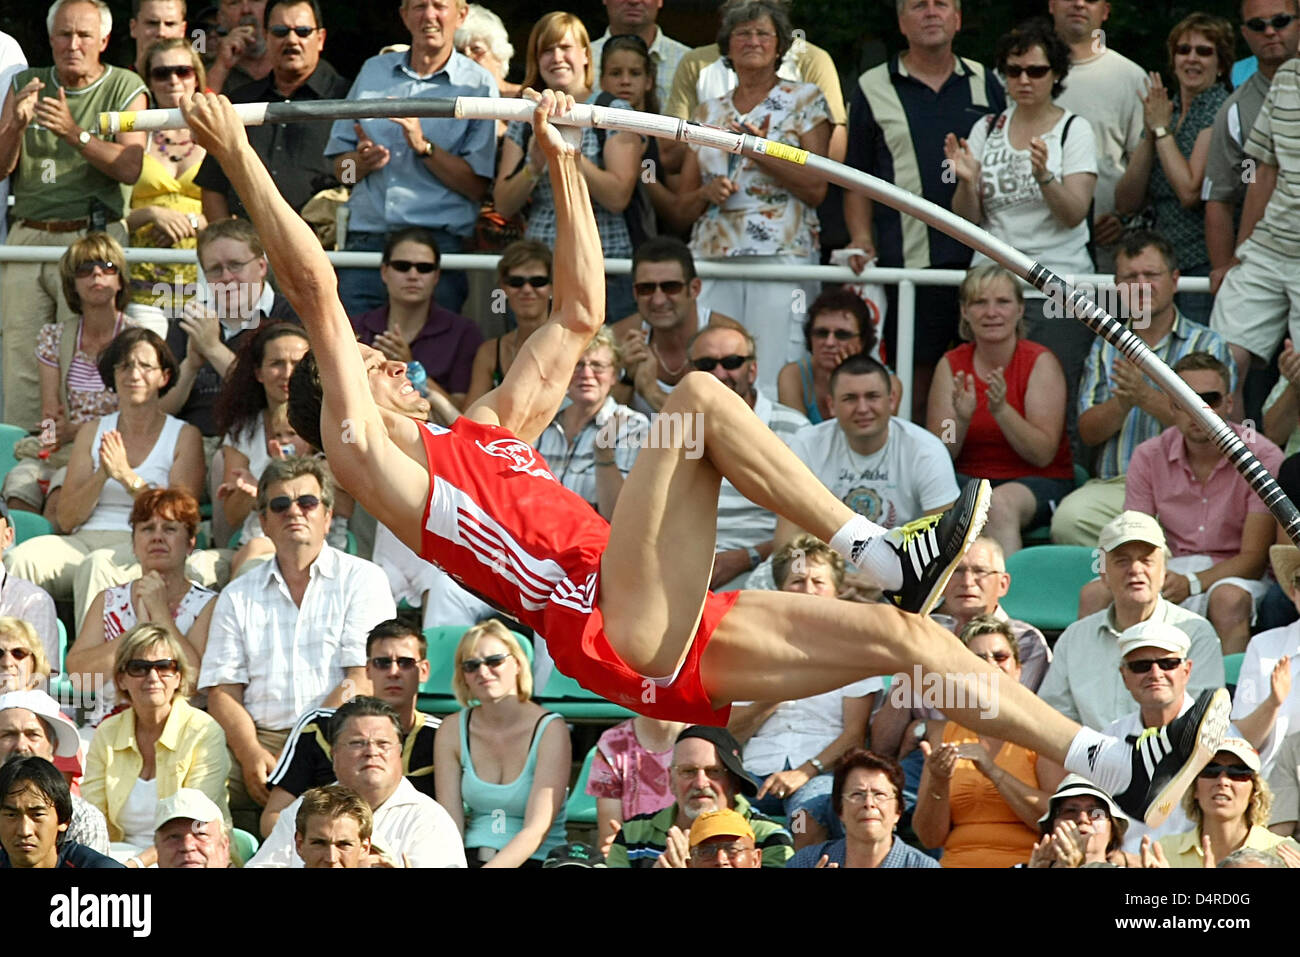 German pole-vaulter Daniel Ecker of TSV Bayer 04 Leverkusen seen in action during the 20th International Athletics - Stock Image